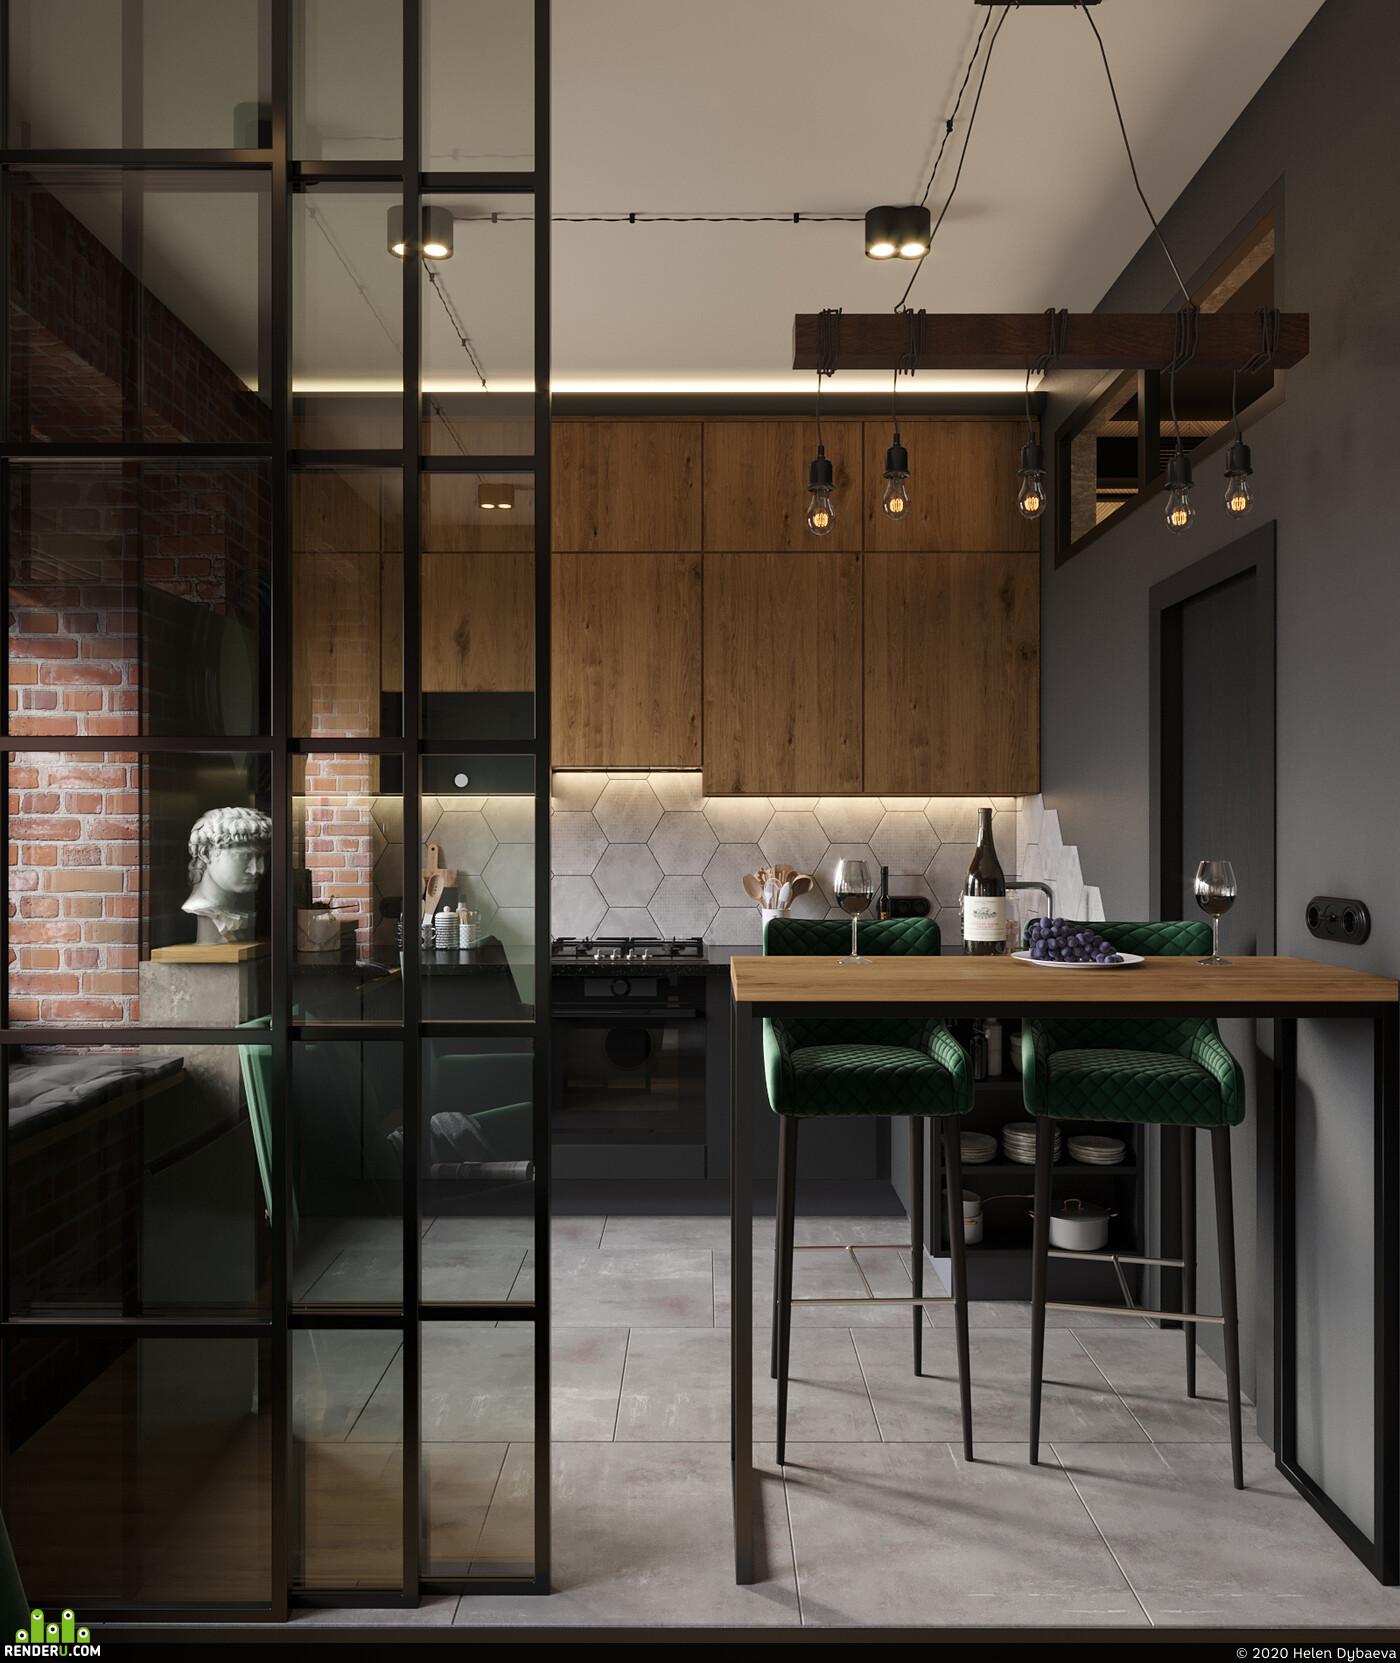 kitchen, Vis, visualizatiion, design, interior